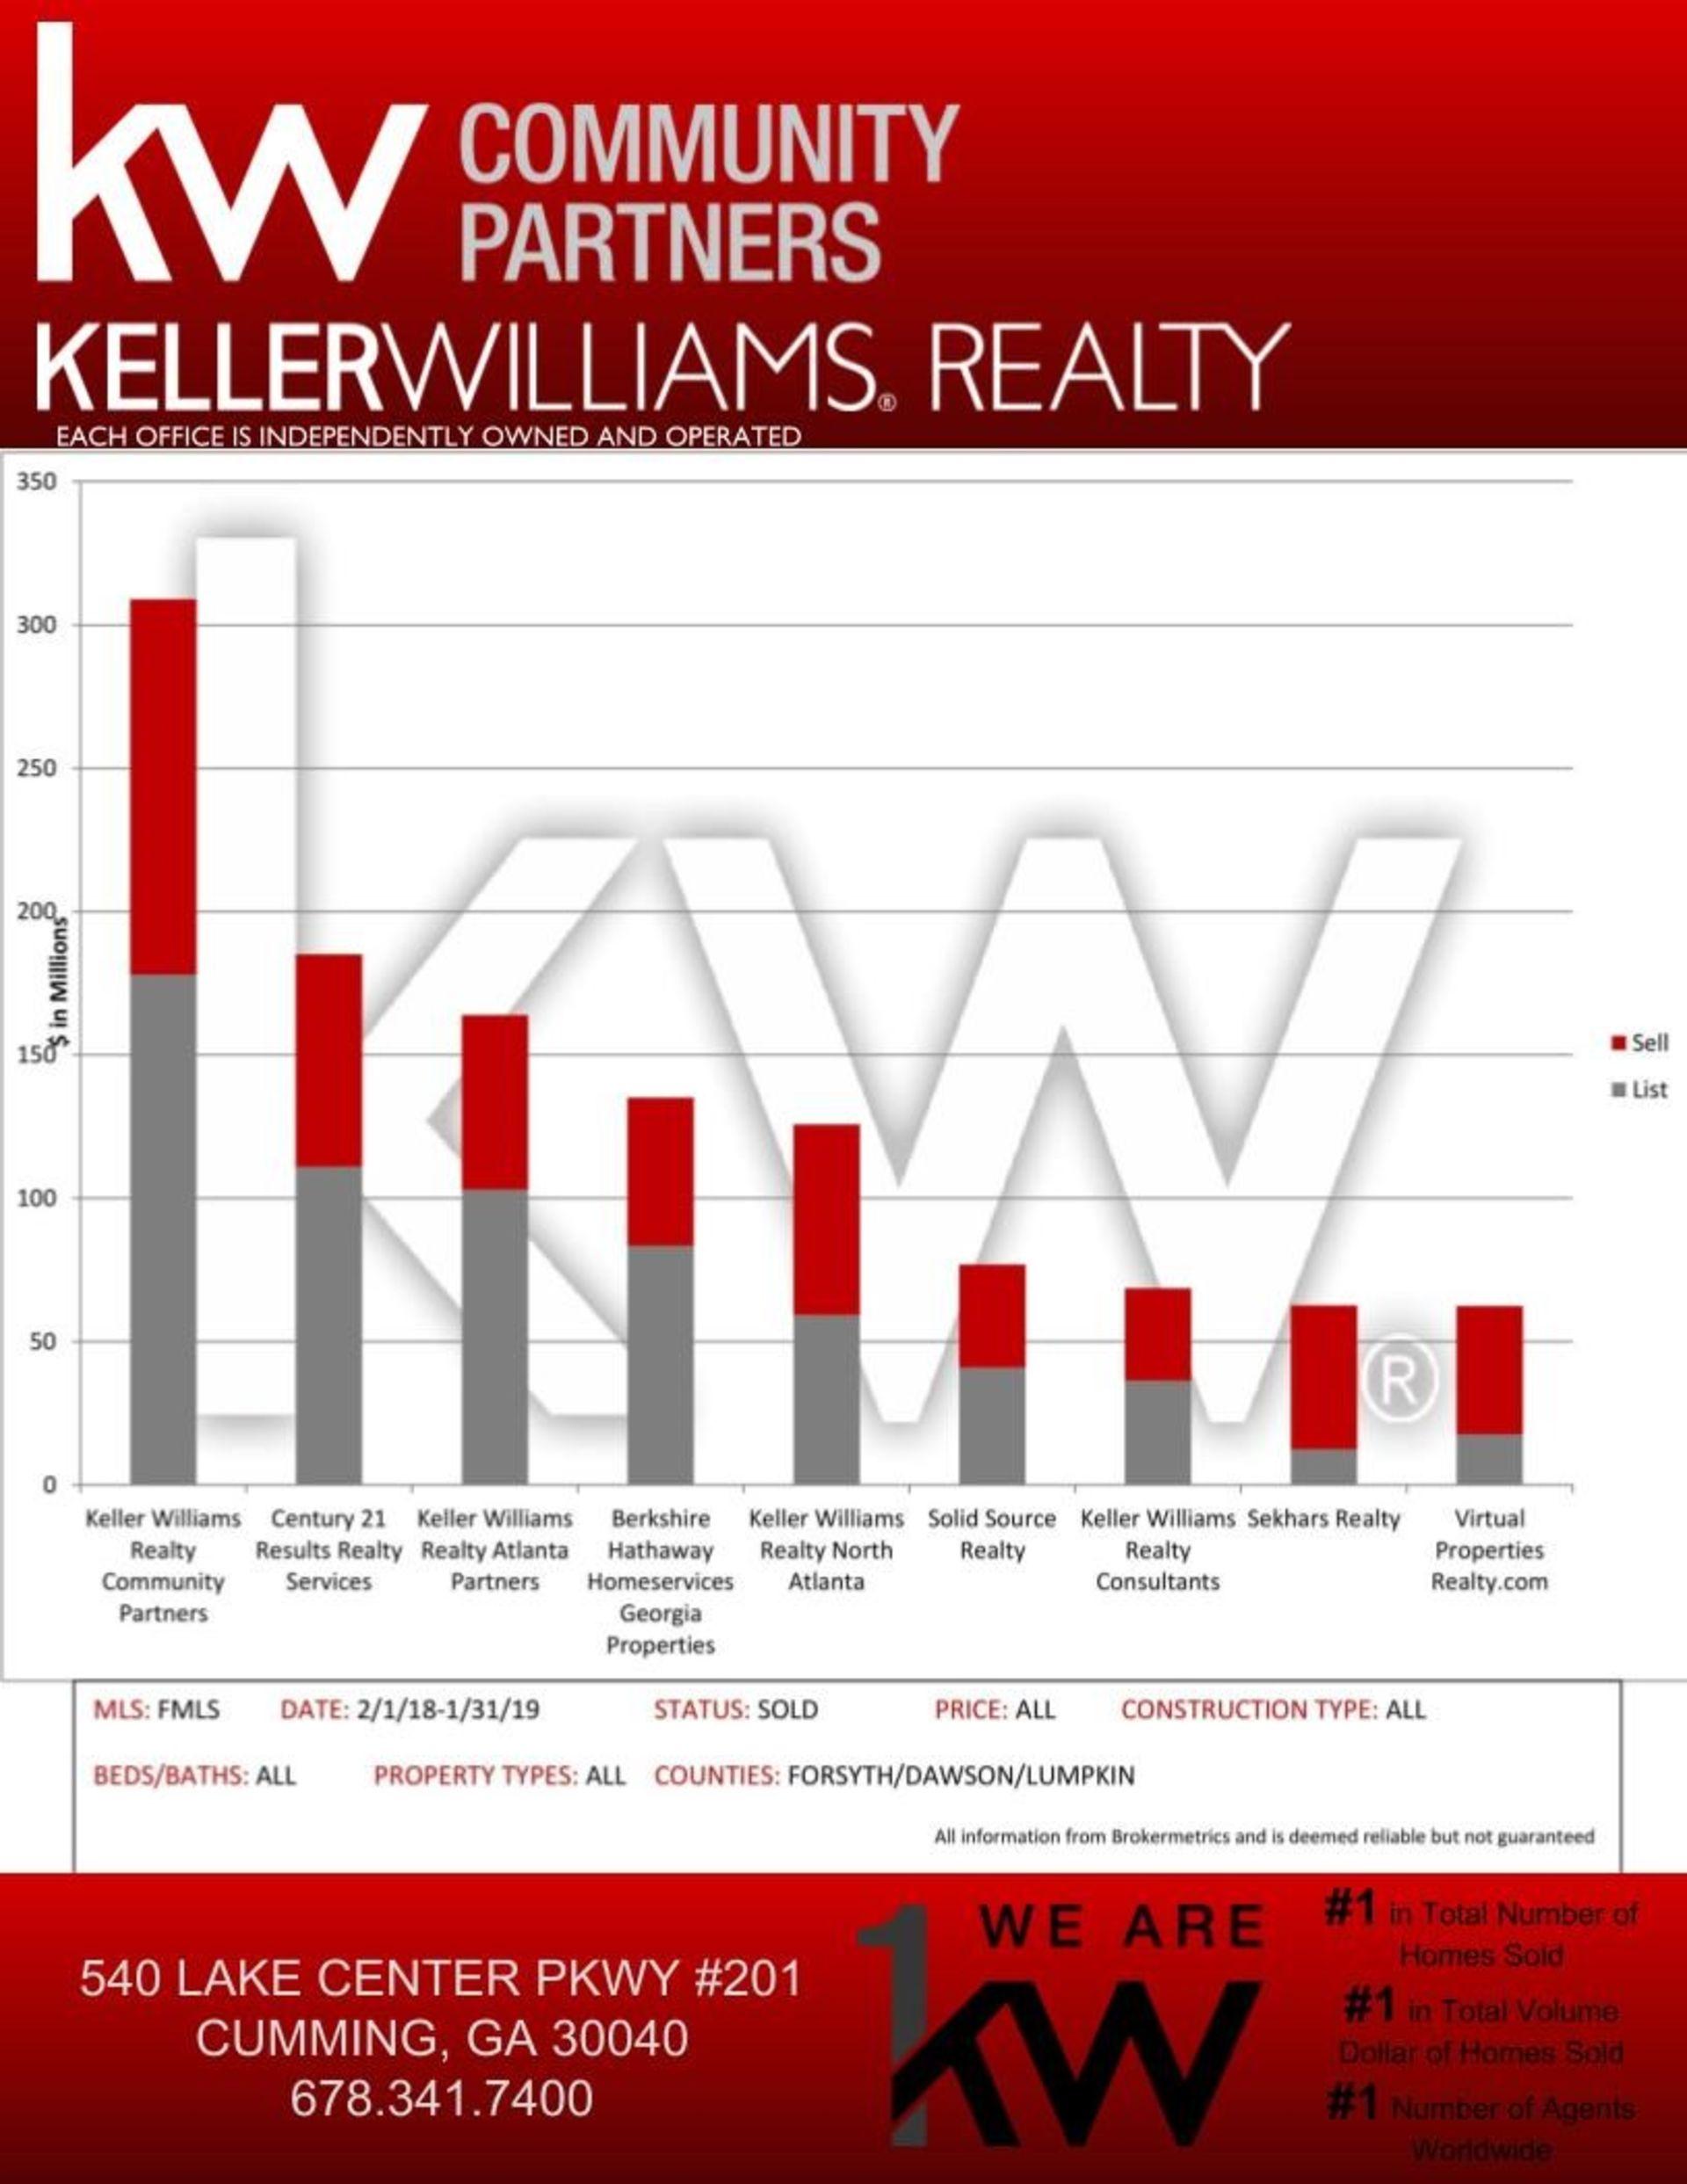 Keller Williams Realty Community Partners is #1